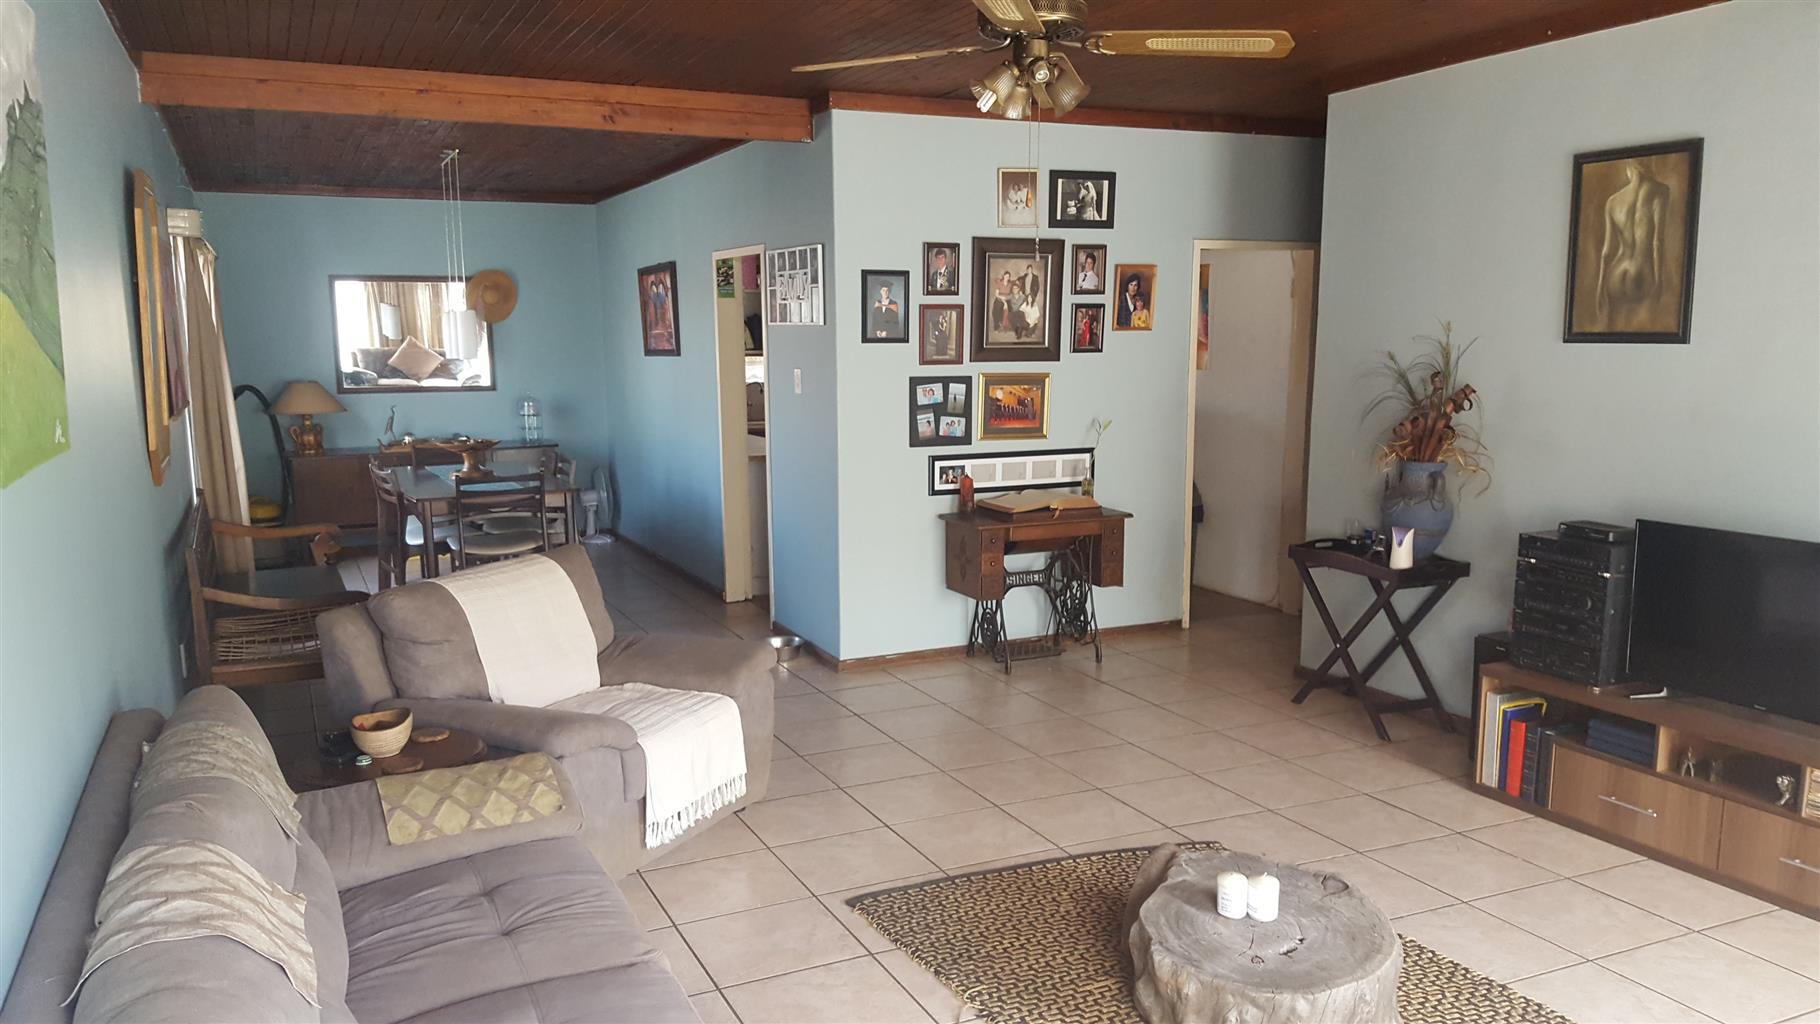 3 Slaapkamer huis te koop in Mountain View.